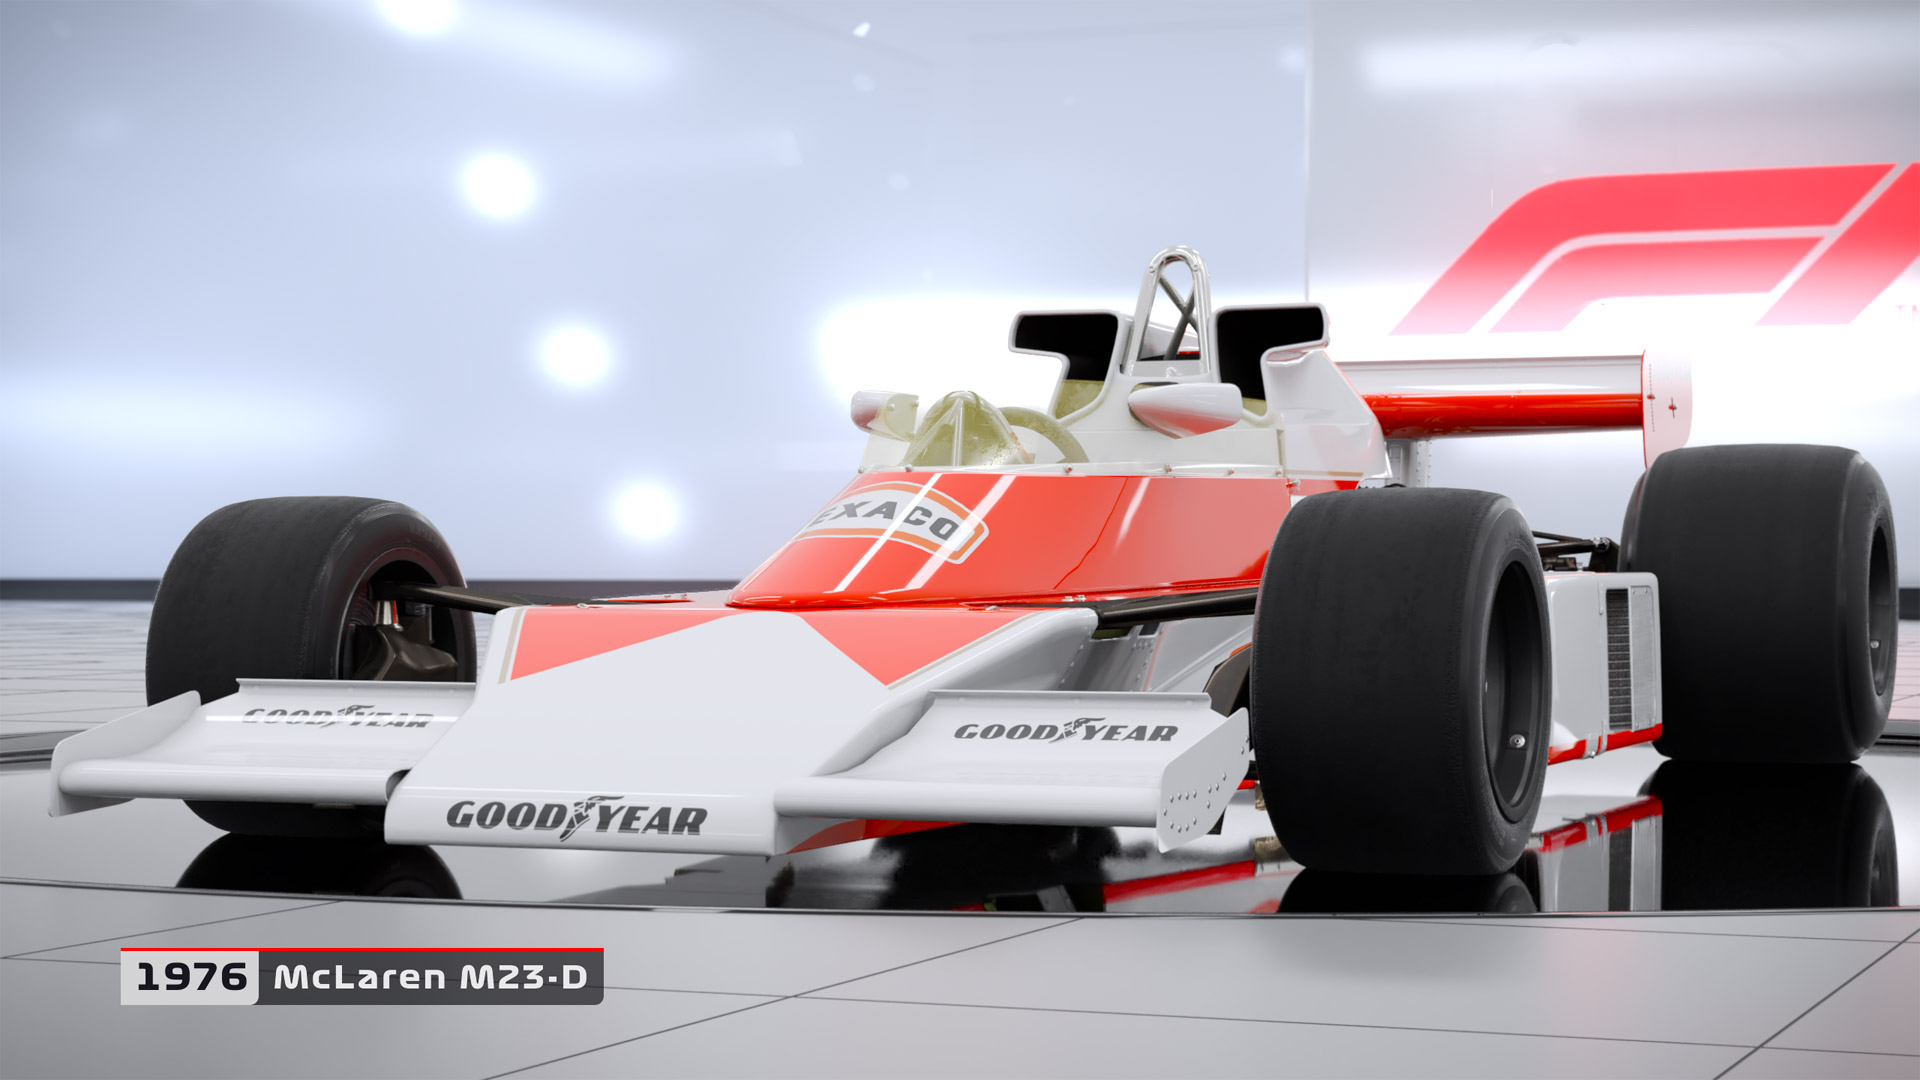 F1 2018 Wallpaper in 1920x1080